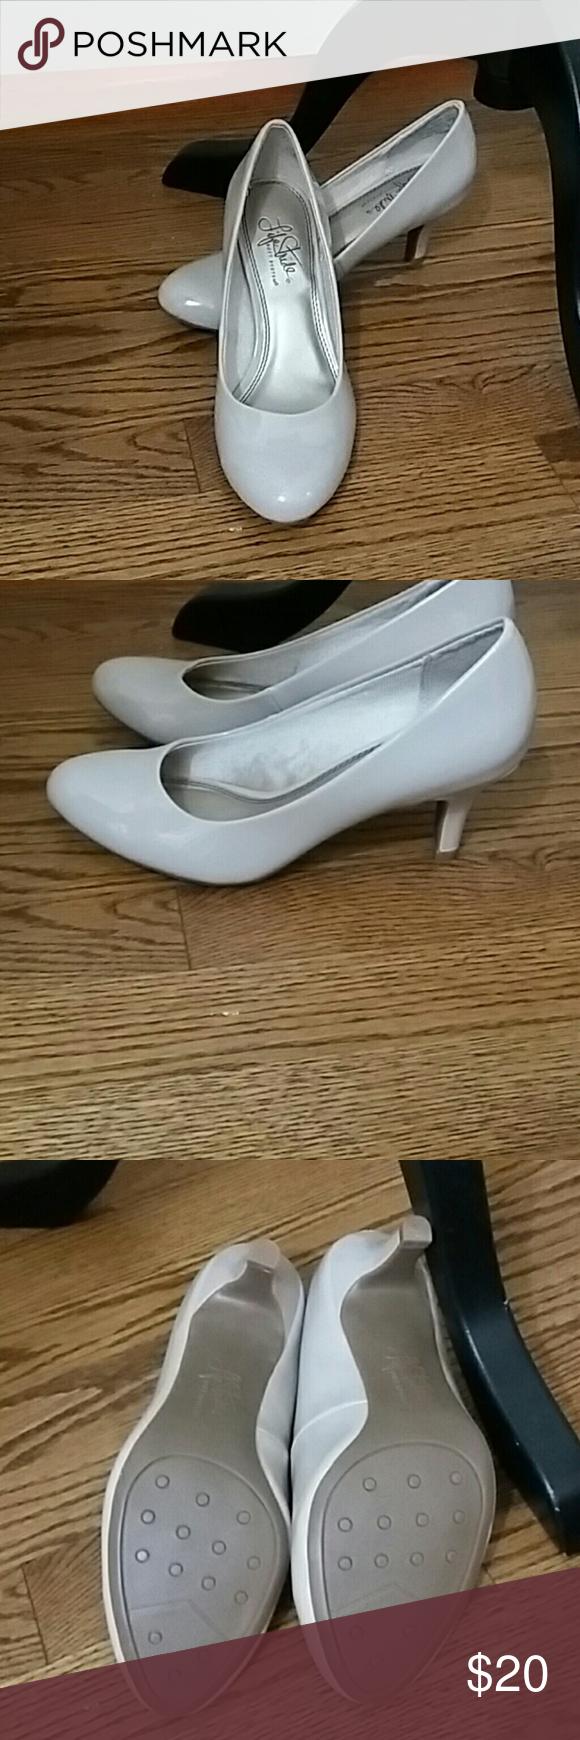 Life Stride pumps Life Stride bone pumps. NWOT size 6.5W Life Stride Shoes Heels